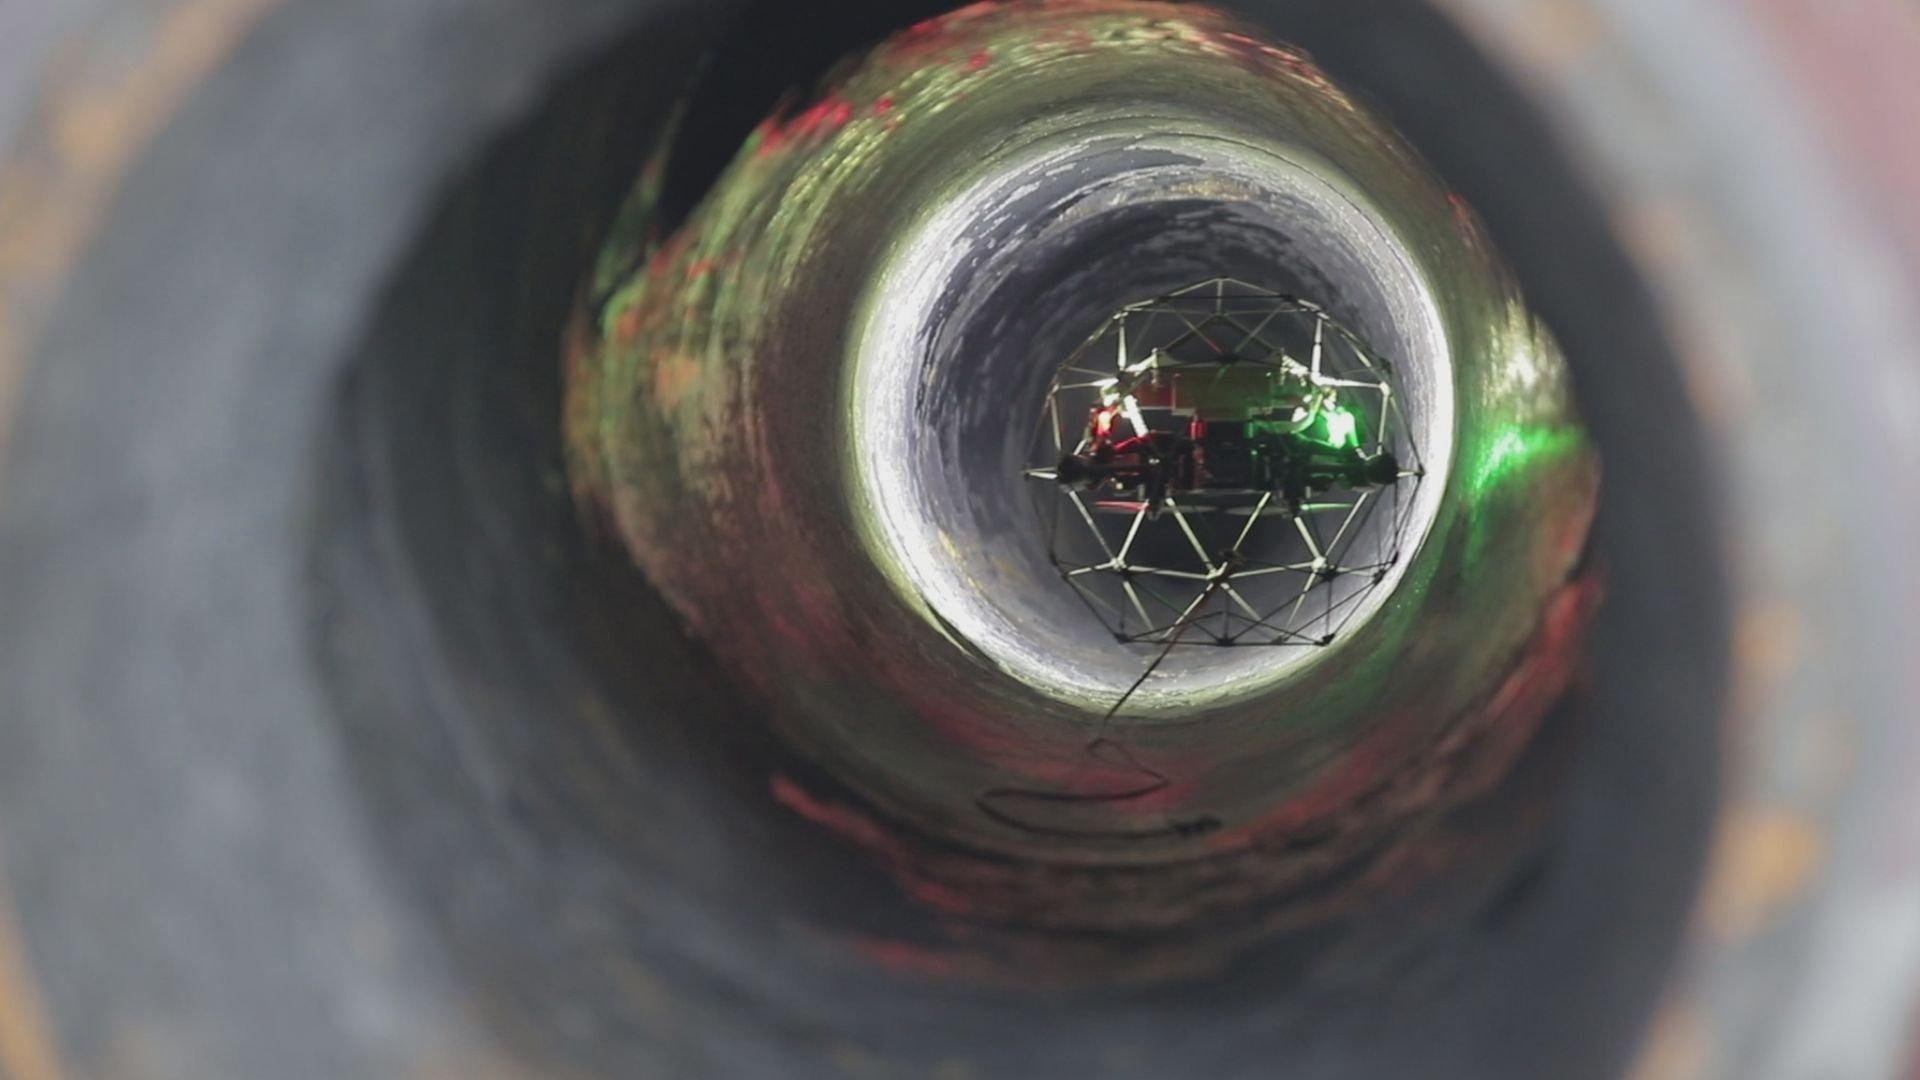 A robot is seen within a storage tank at Turkish refinery giant Tüpraş's Izmit facility. (Courtesy of Tüpraş)